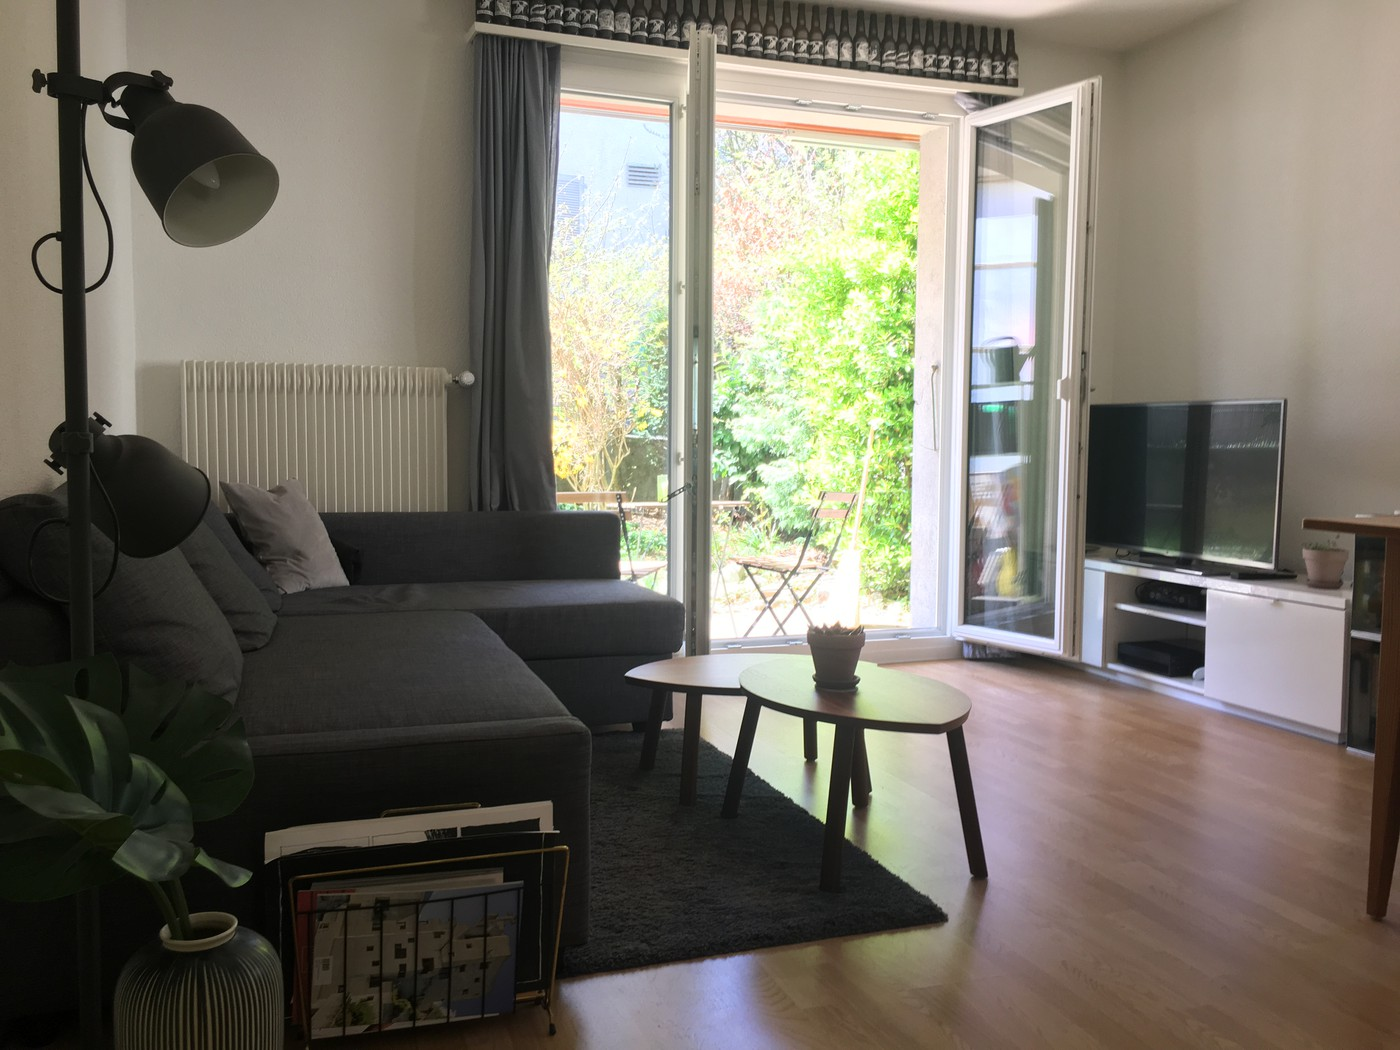 2 Zimmer Wohnung In Bern Mieten Flatfox